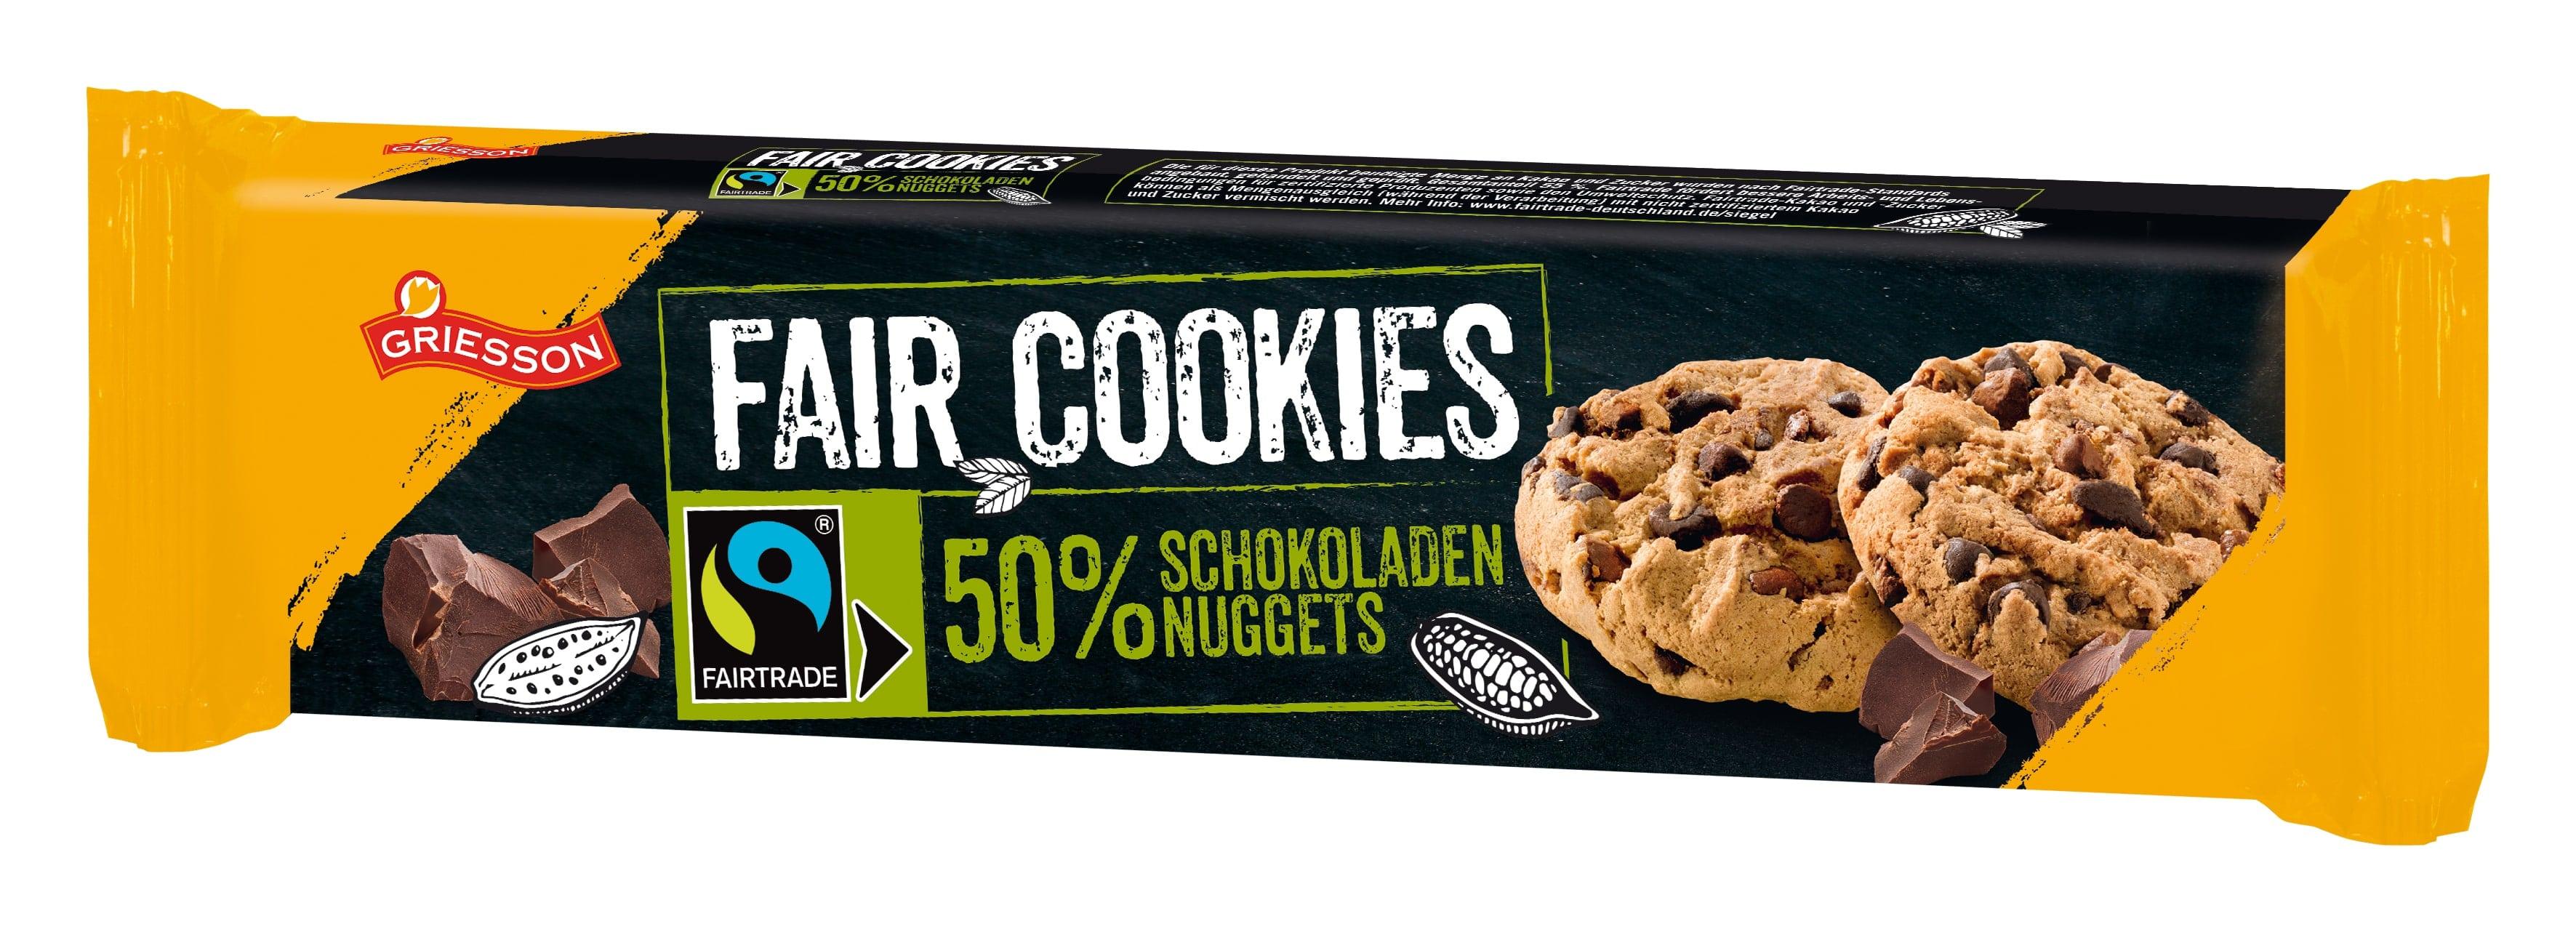 GR Fair Cookies